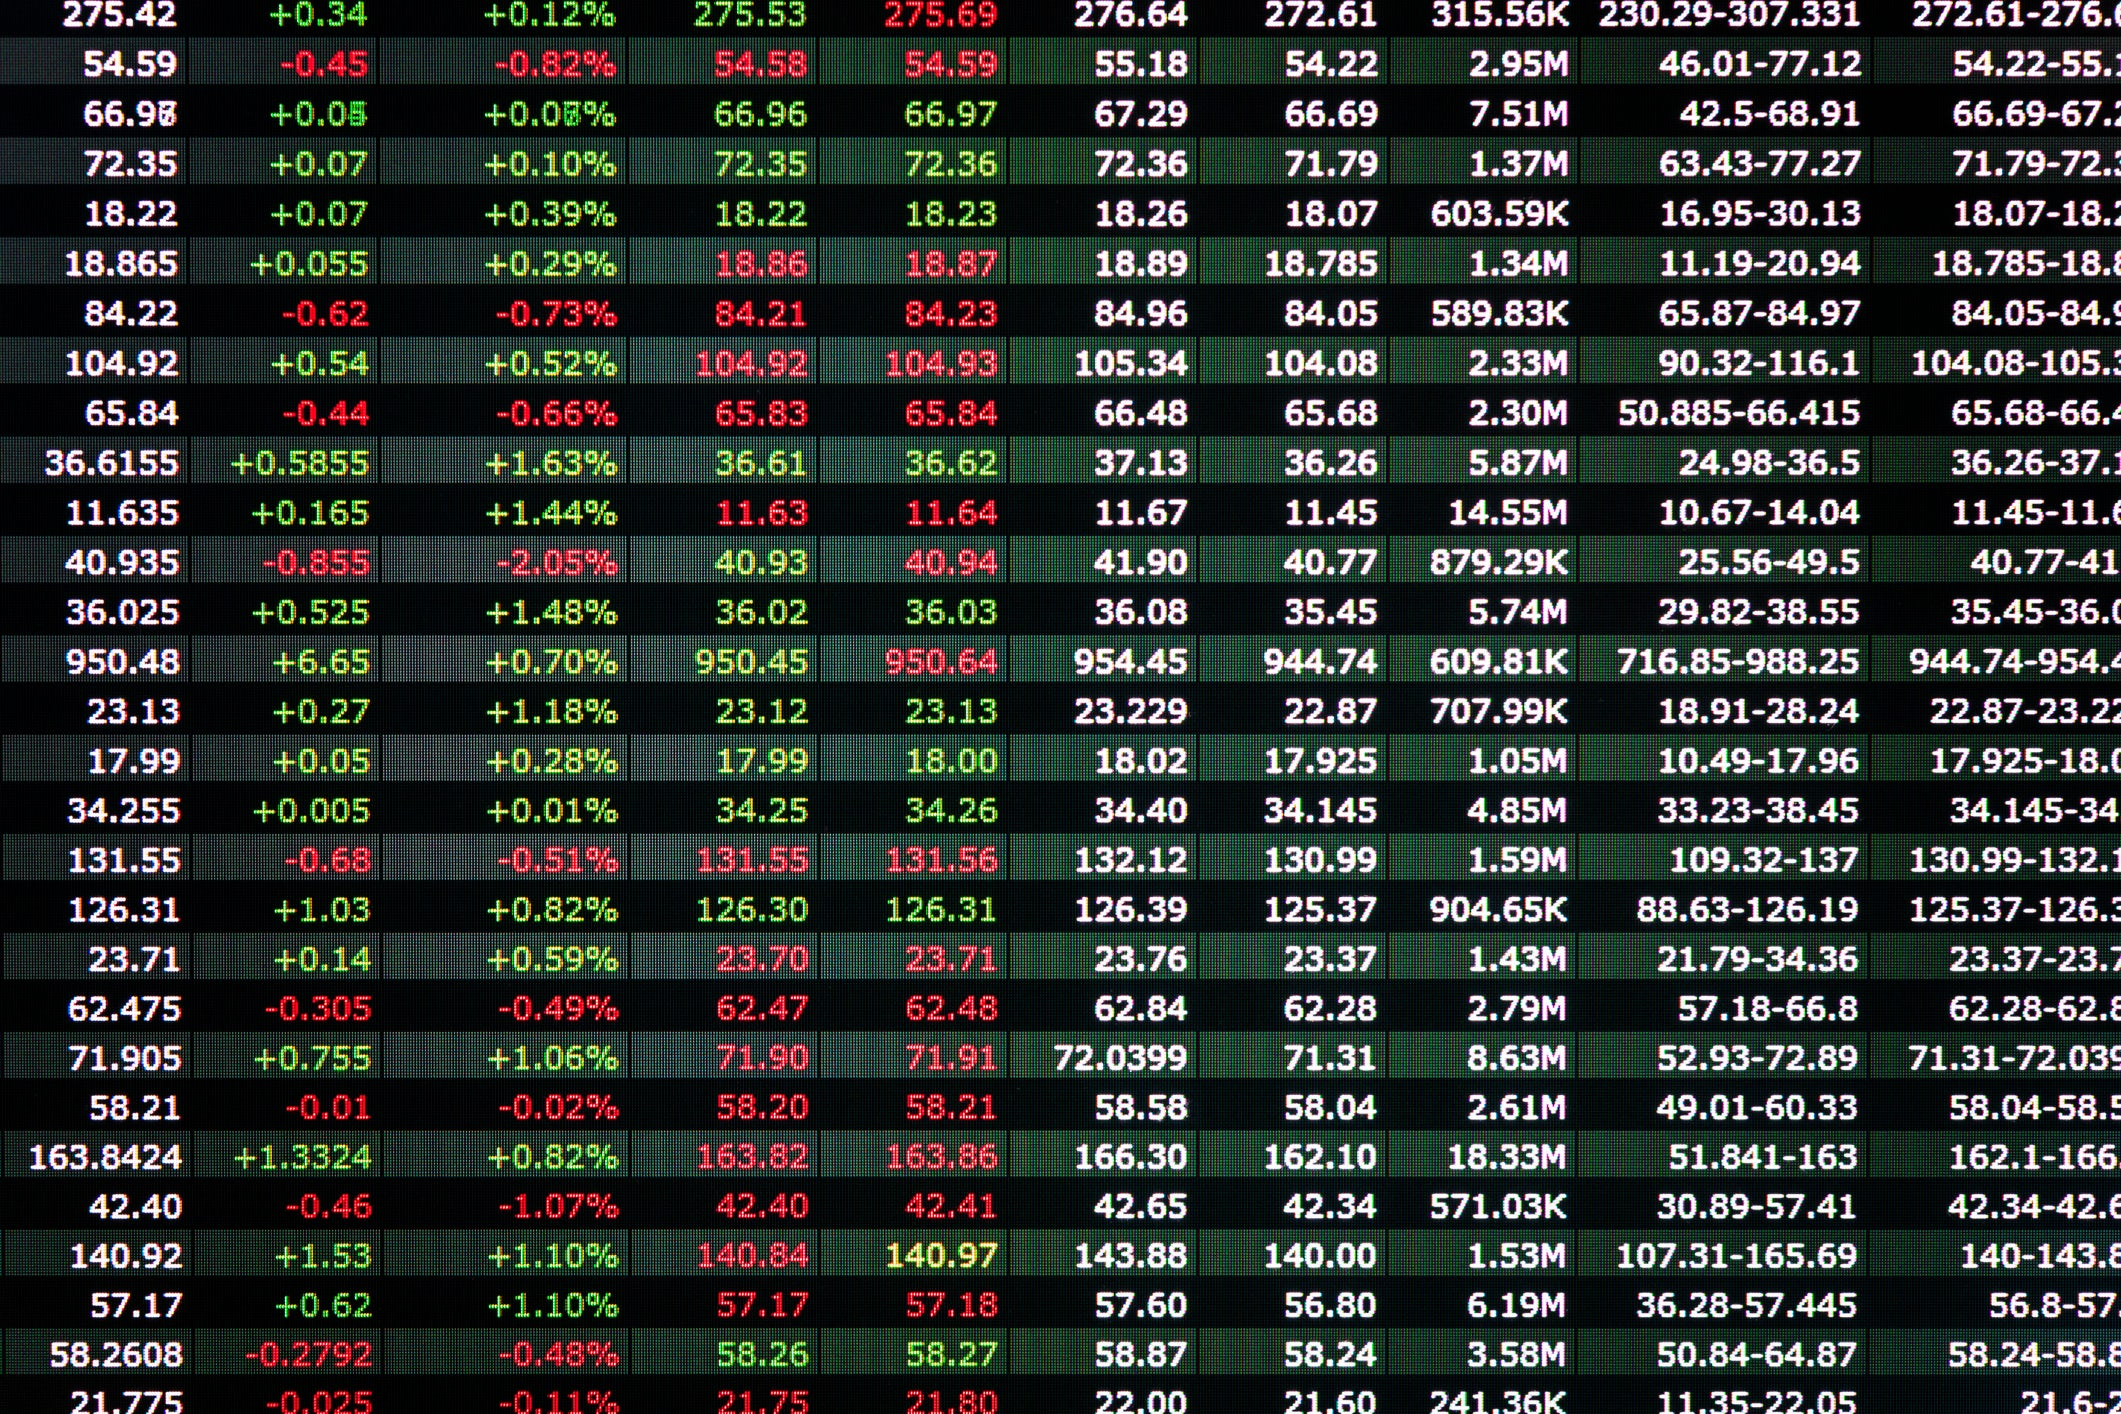 Vicsuper change your investment options